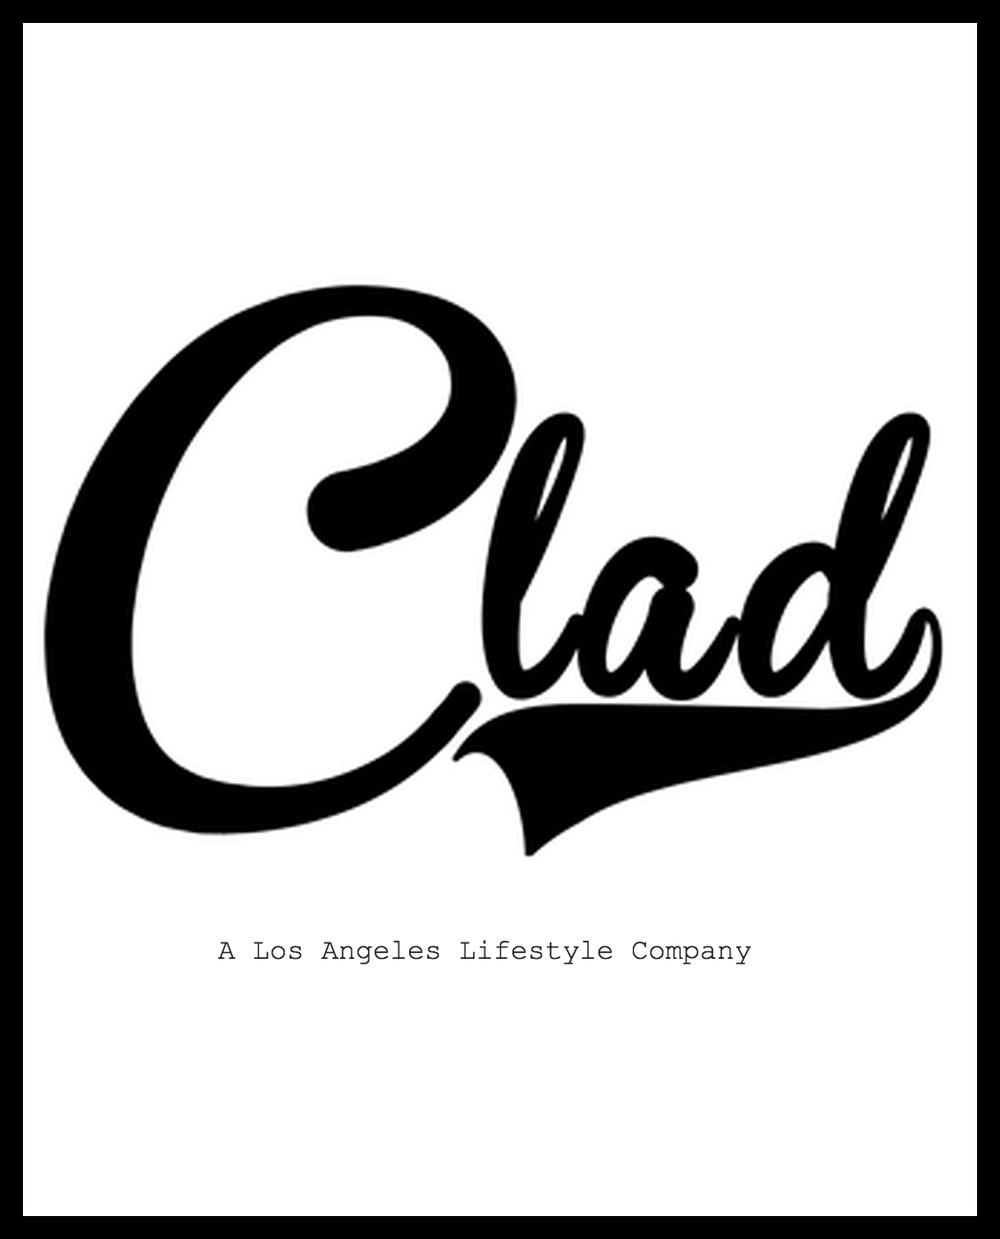 clad logo.jpg